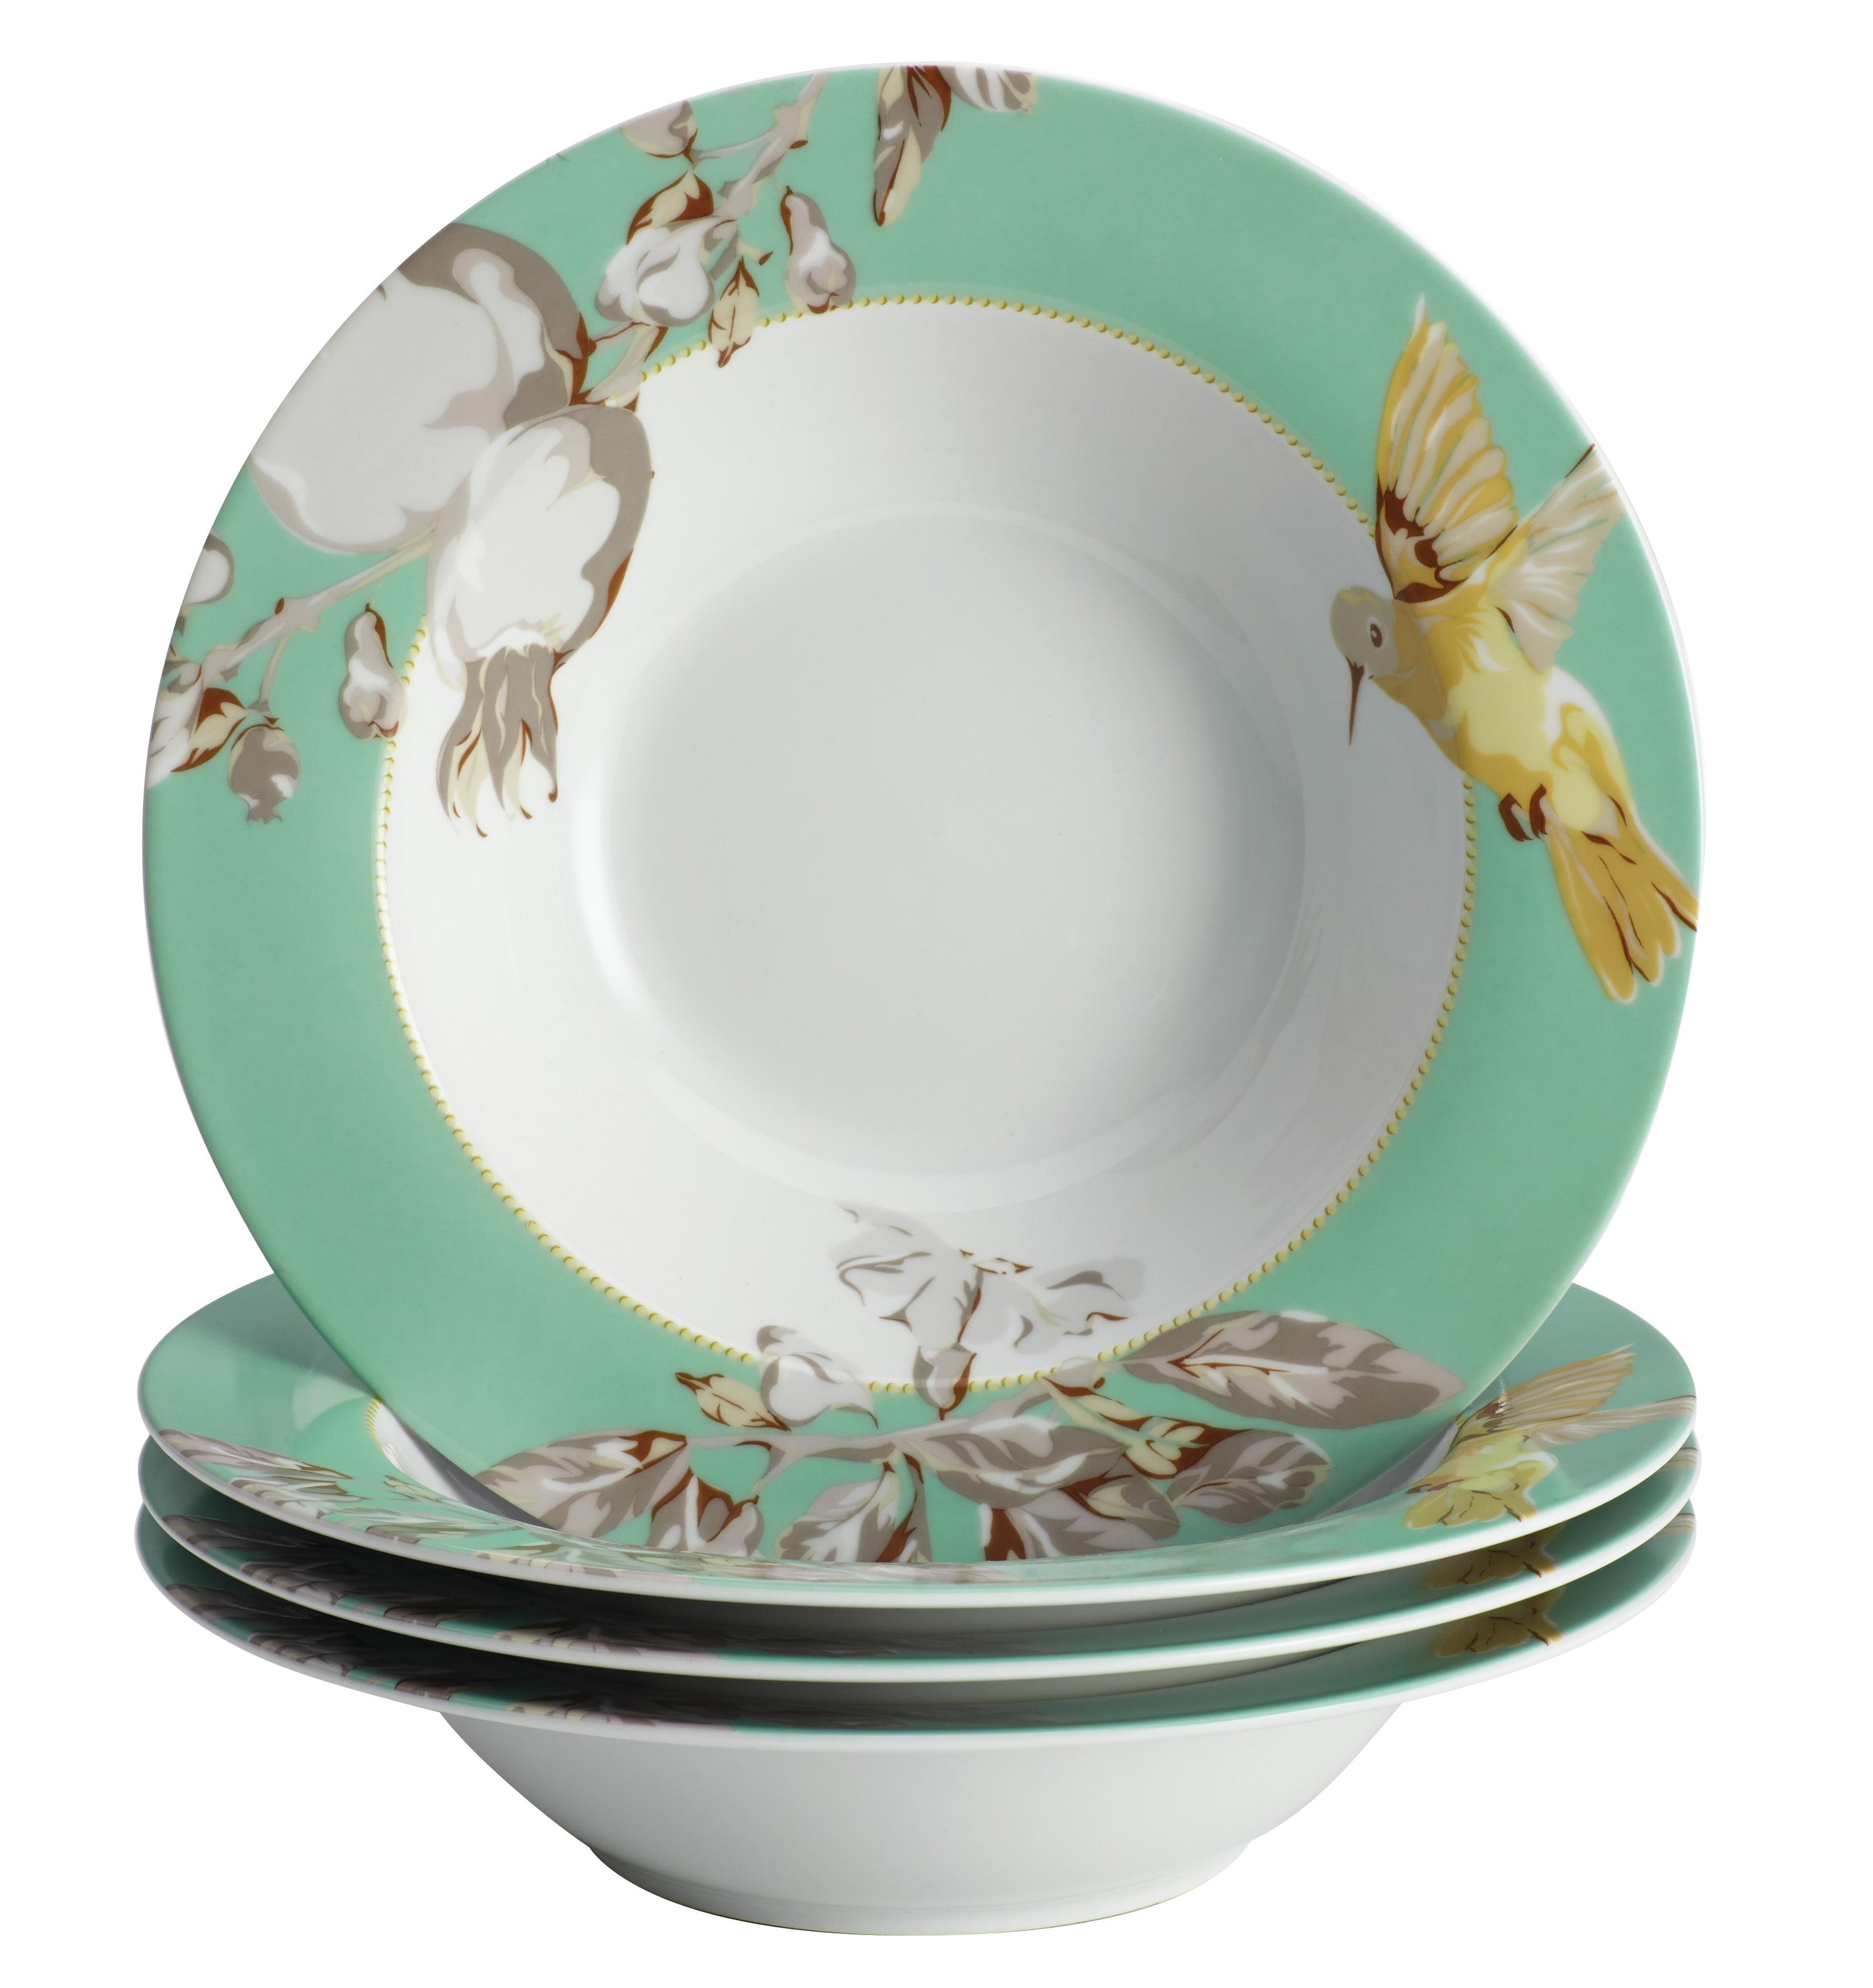 BonJour Dinnerware Fruitful Nectar Porcelain 4-Piece Soup/Pasta Bowl Set, Print